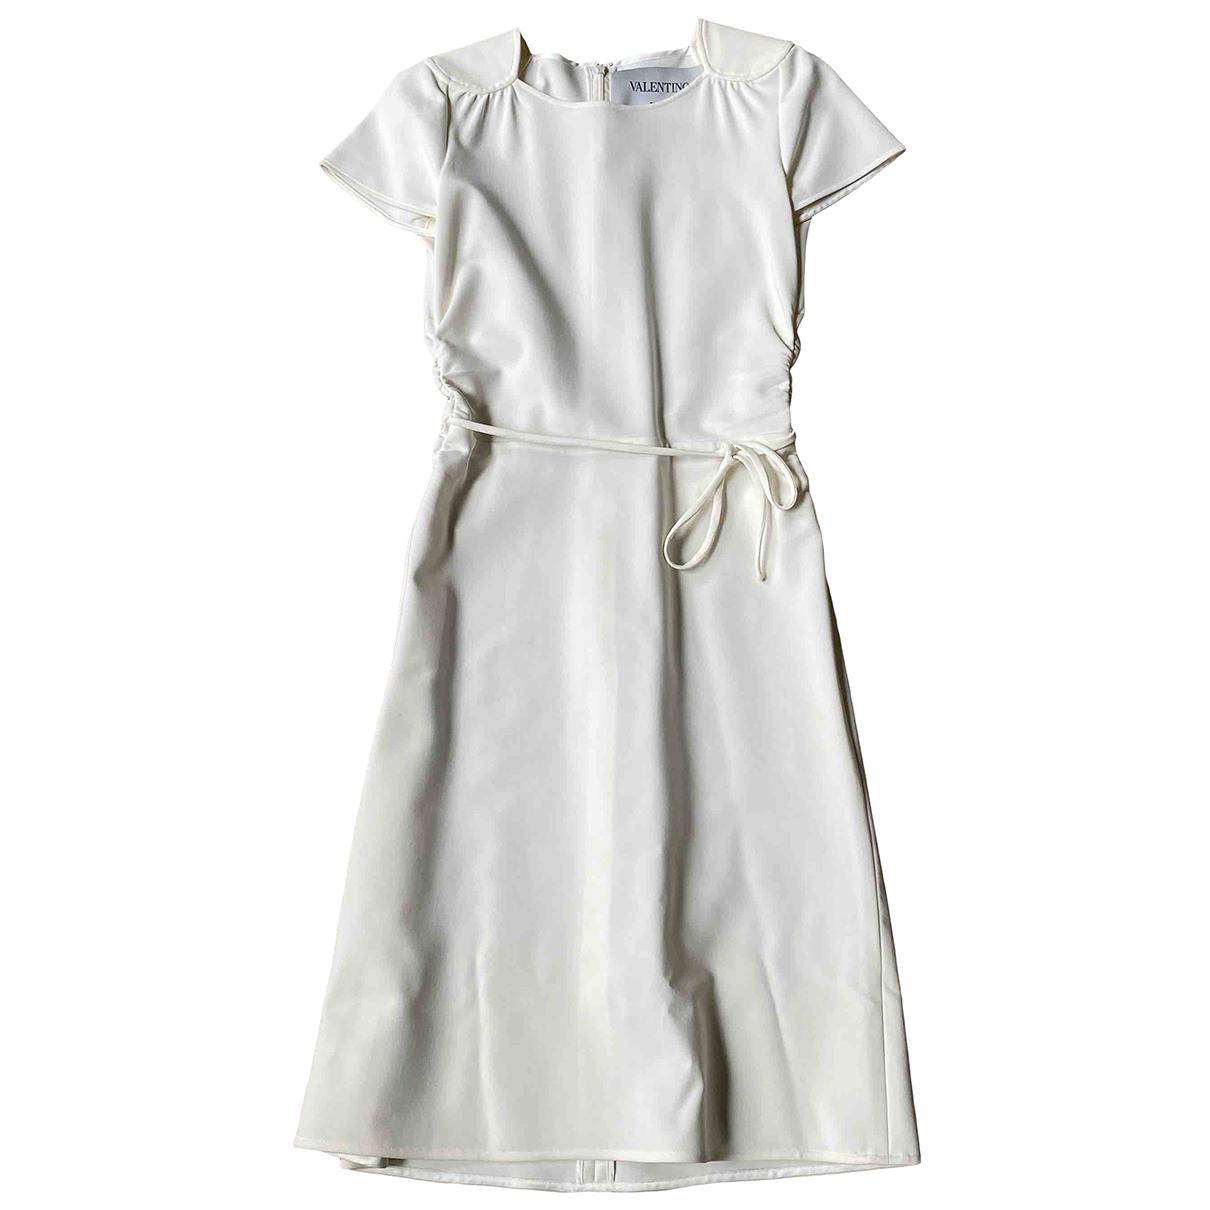 Valentino Garavani \N Ecru dress for Women 40 IT